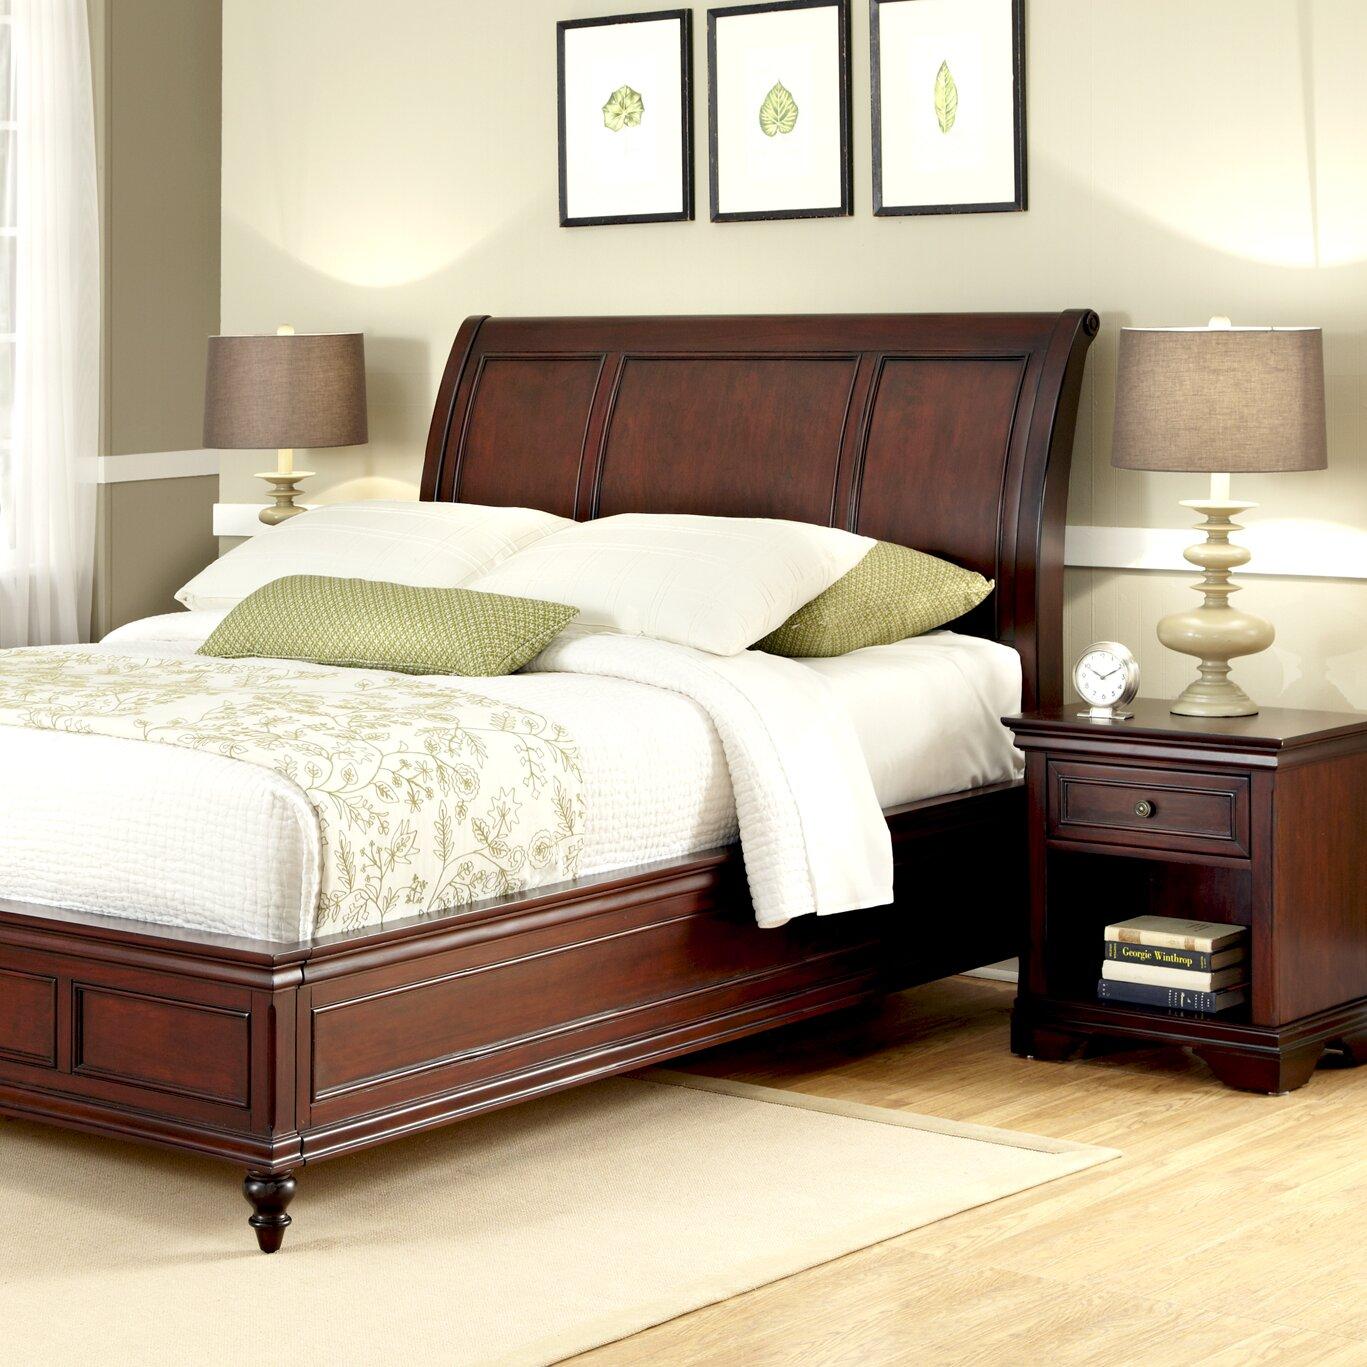 Home Styles Lafayette Platform 2 Piece Bedroom Set Reviews Wayfair